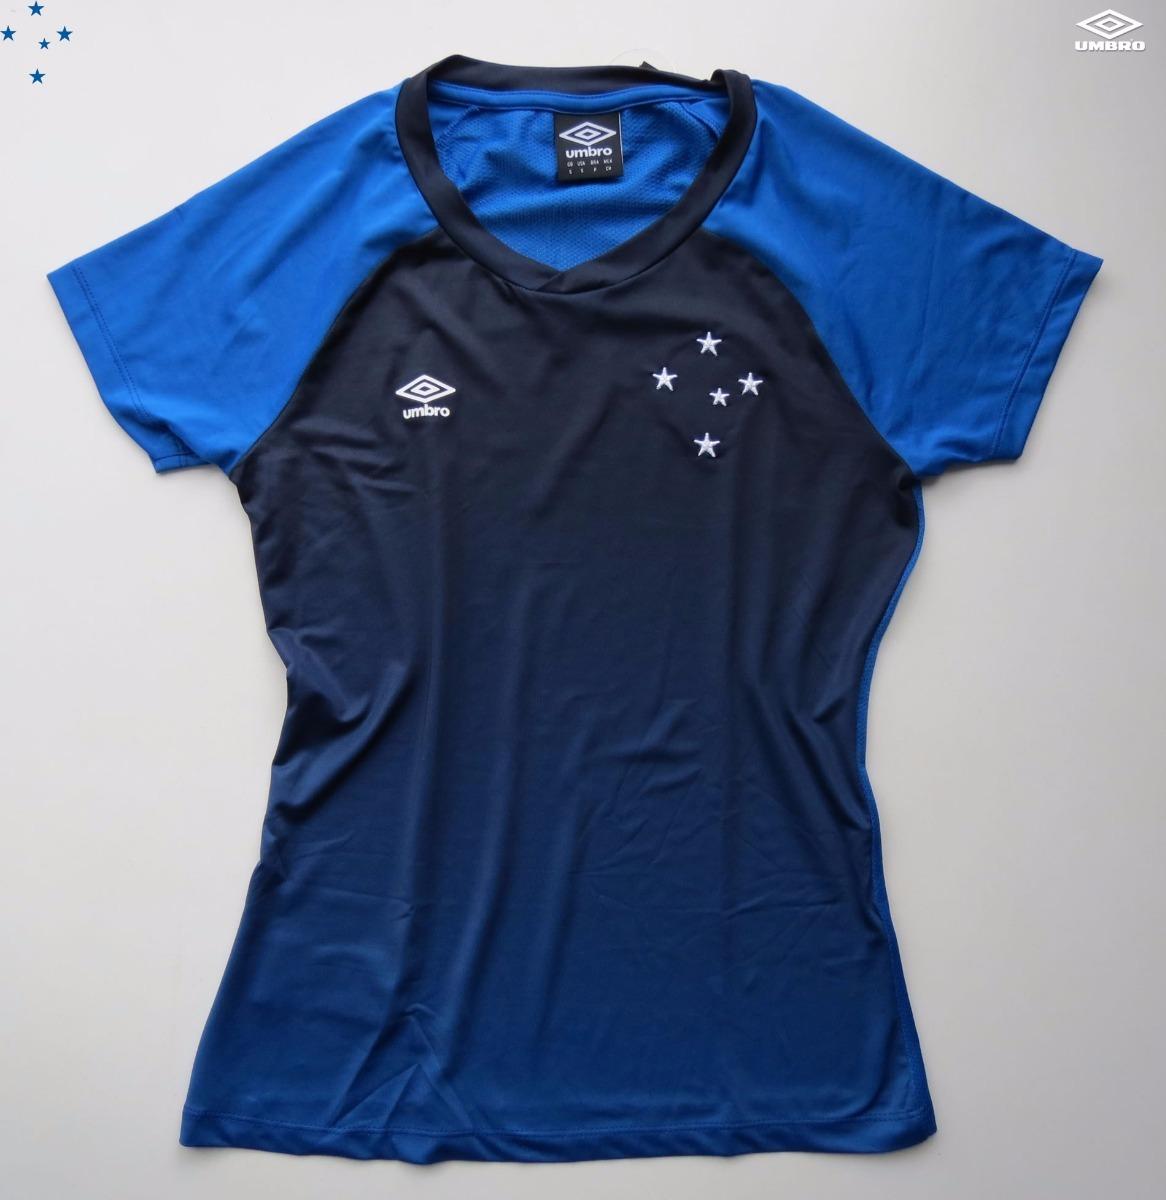 10d16fcd13 Camisa Feminina Do Cruzeiro Umbro 2018 Oficial - R  99